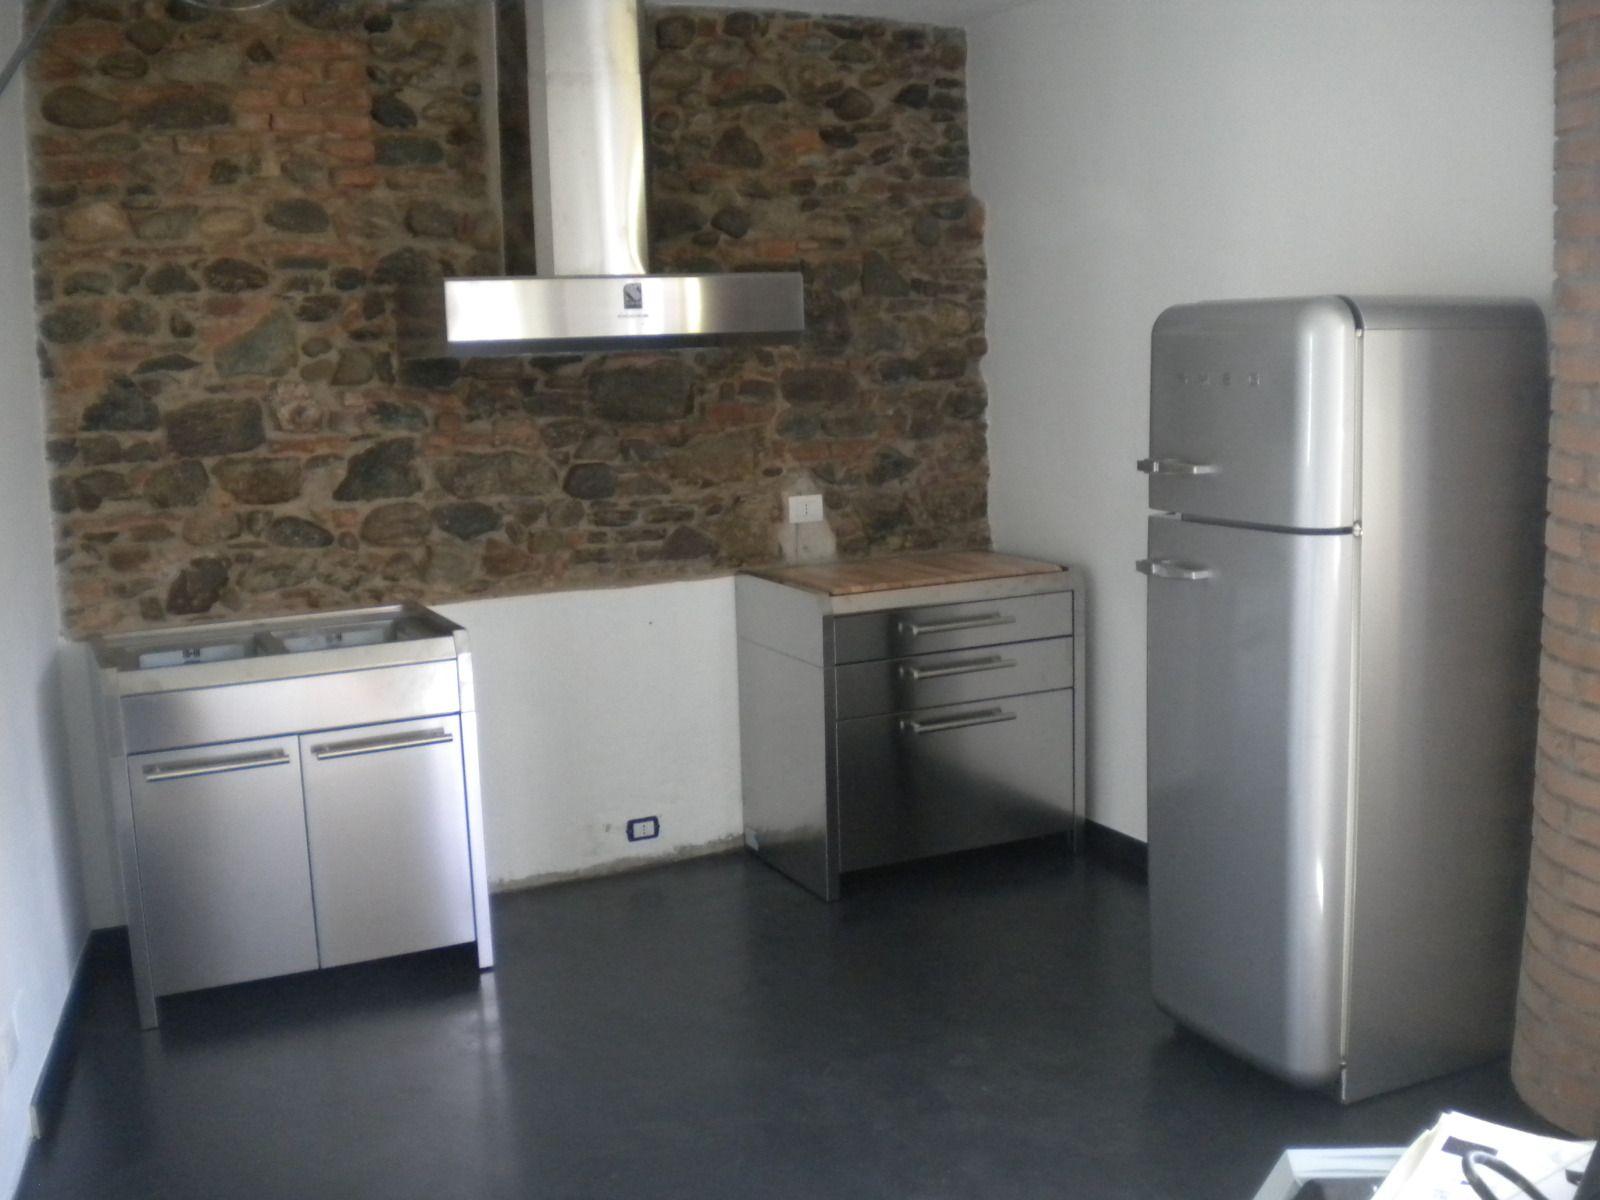 steel cucine sintesi prezzo - Cerca con Google   kitchen   Pinterest ...